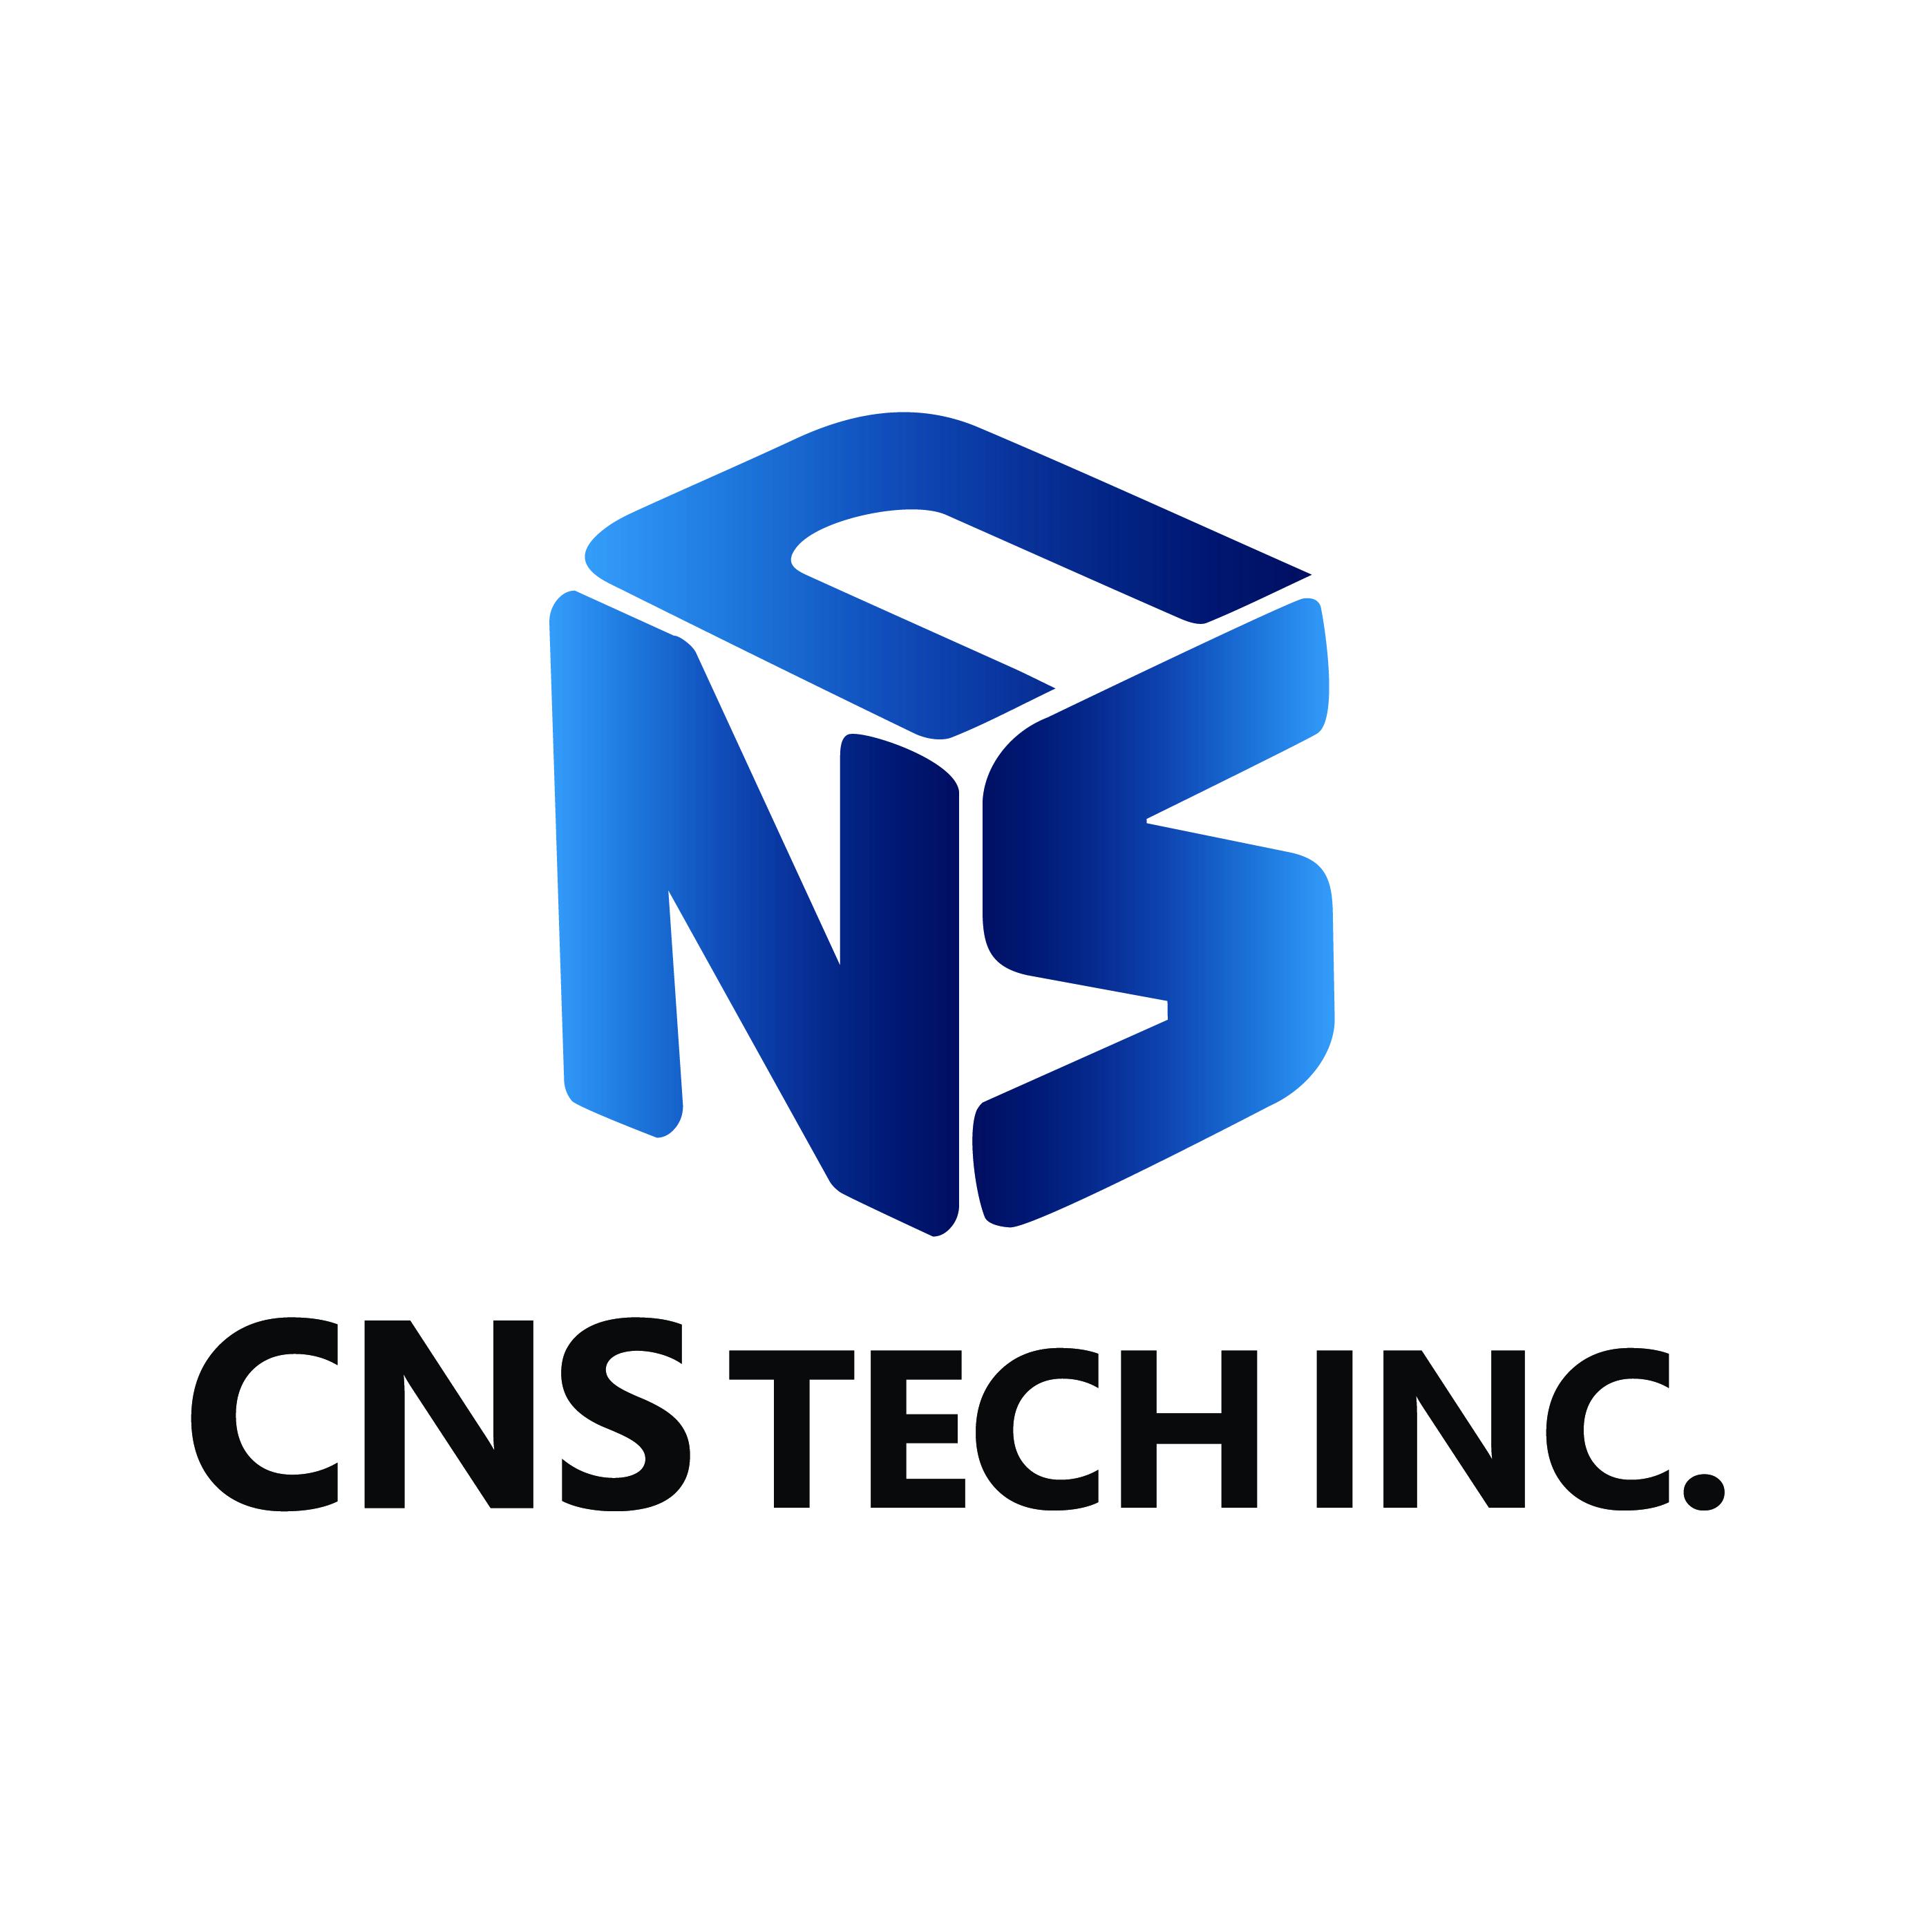 CNS TECH